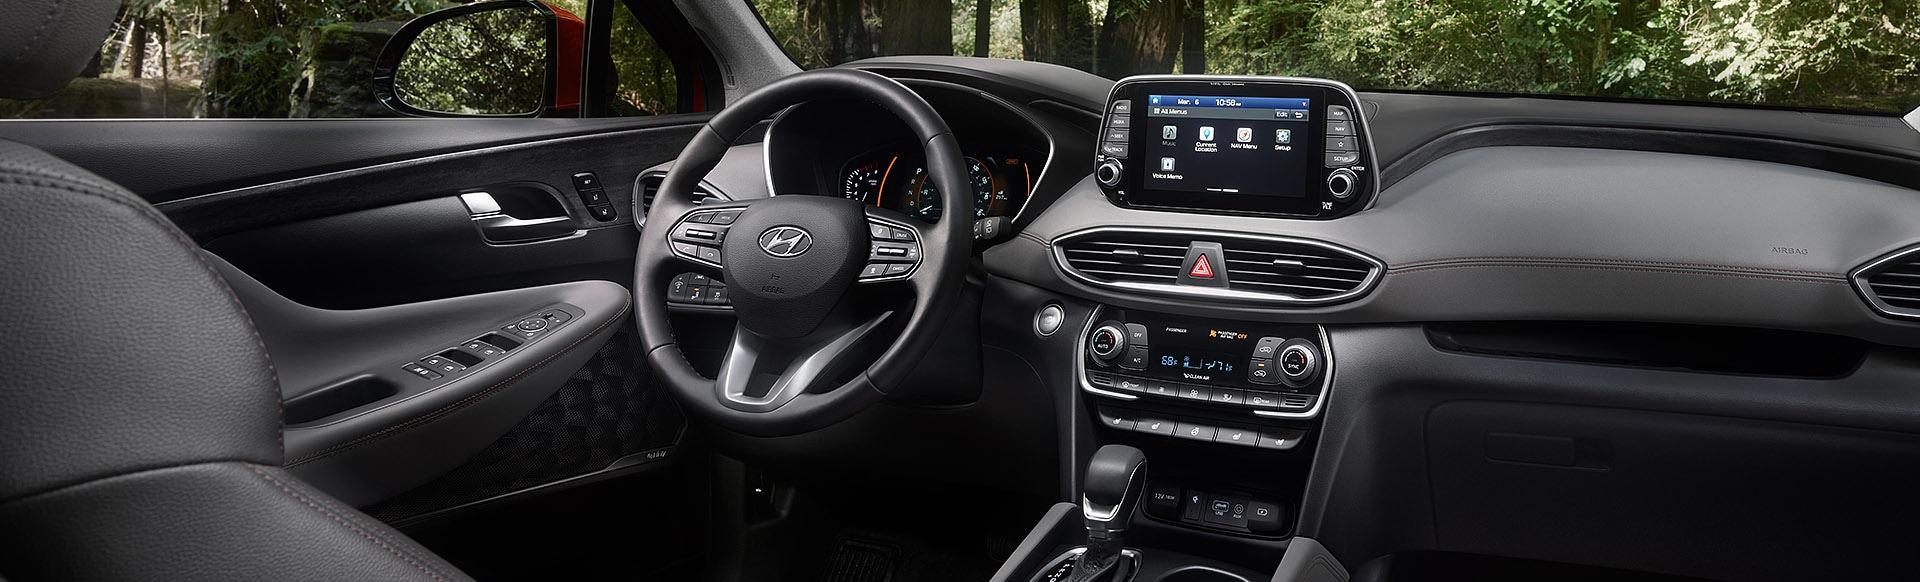 All-New 2019 Hyundai Santa Fe Interior